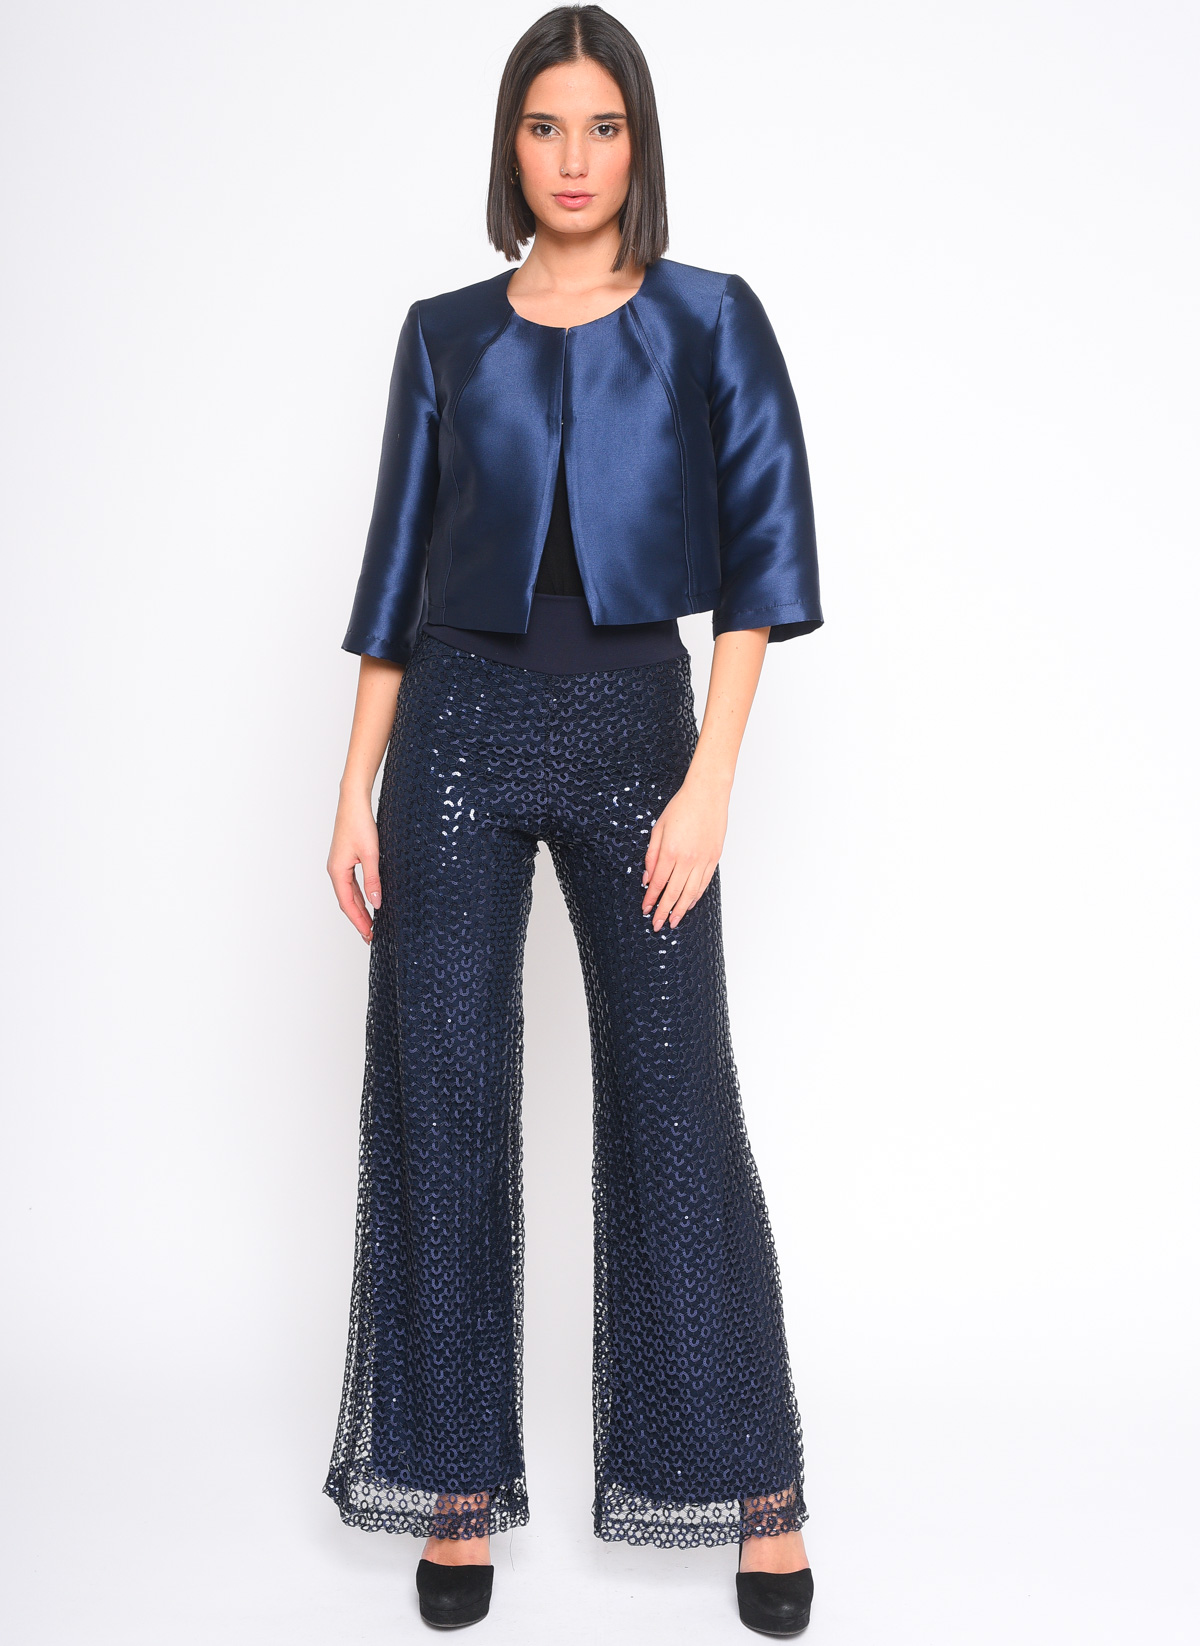 GIACCA BOLERO IN SHANTUNG for women - BLUE - Paquito Pronto Moda Shop Online